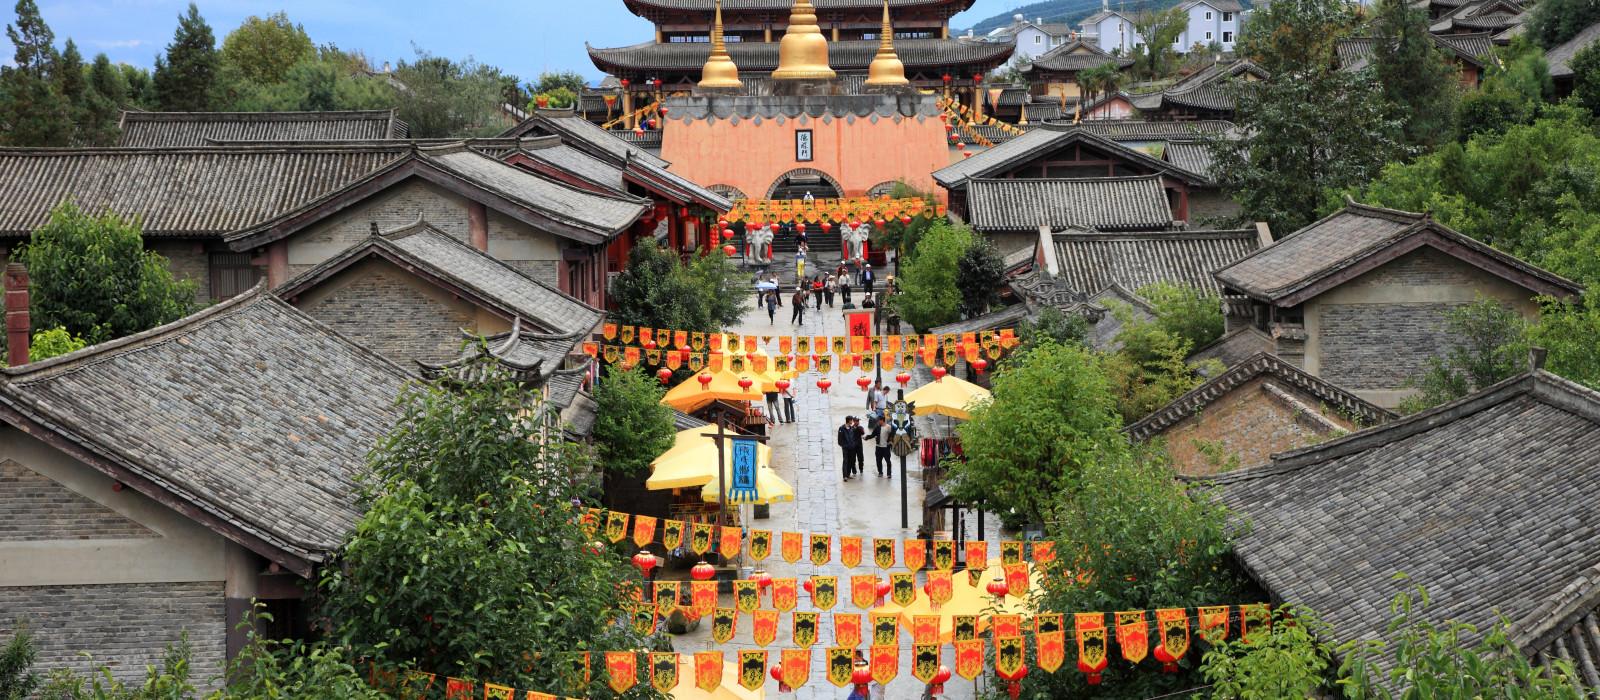 Reiseziel Dali China